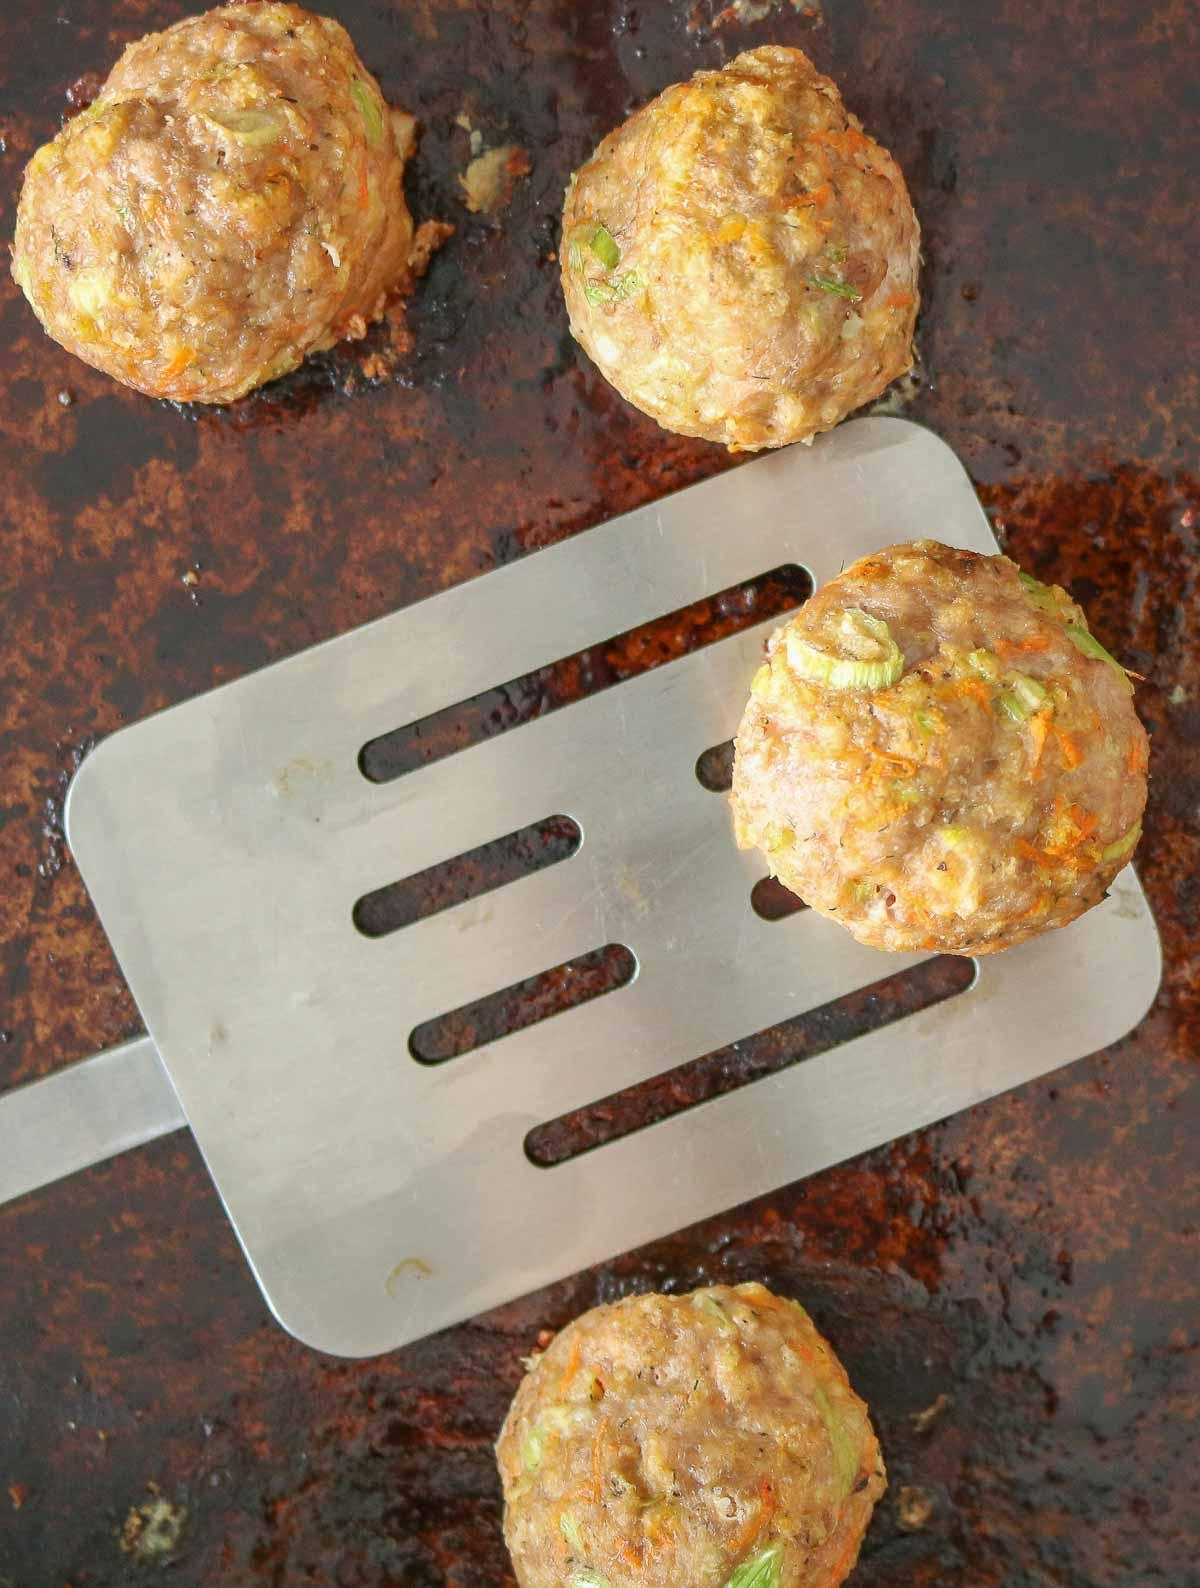 Spatula picking up a turkey meatball from a sheet pan.